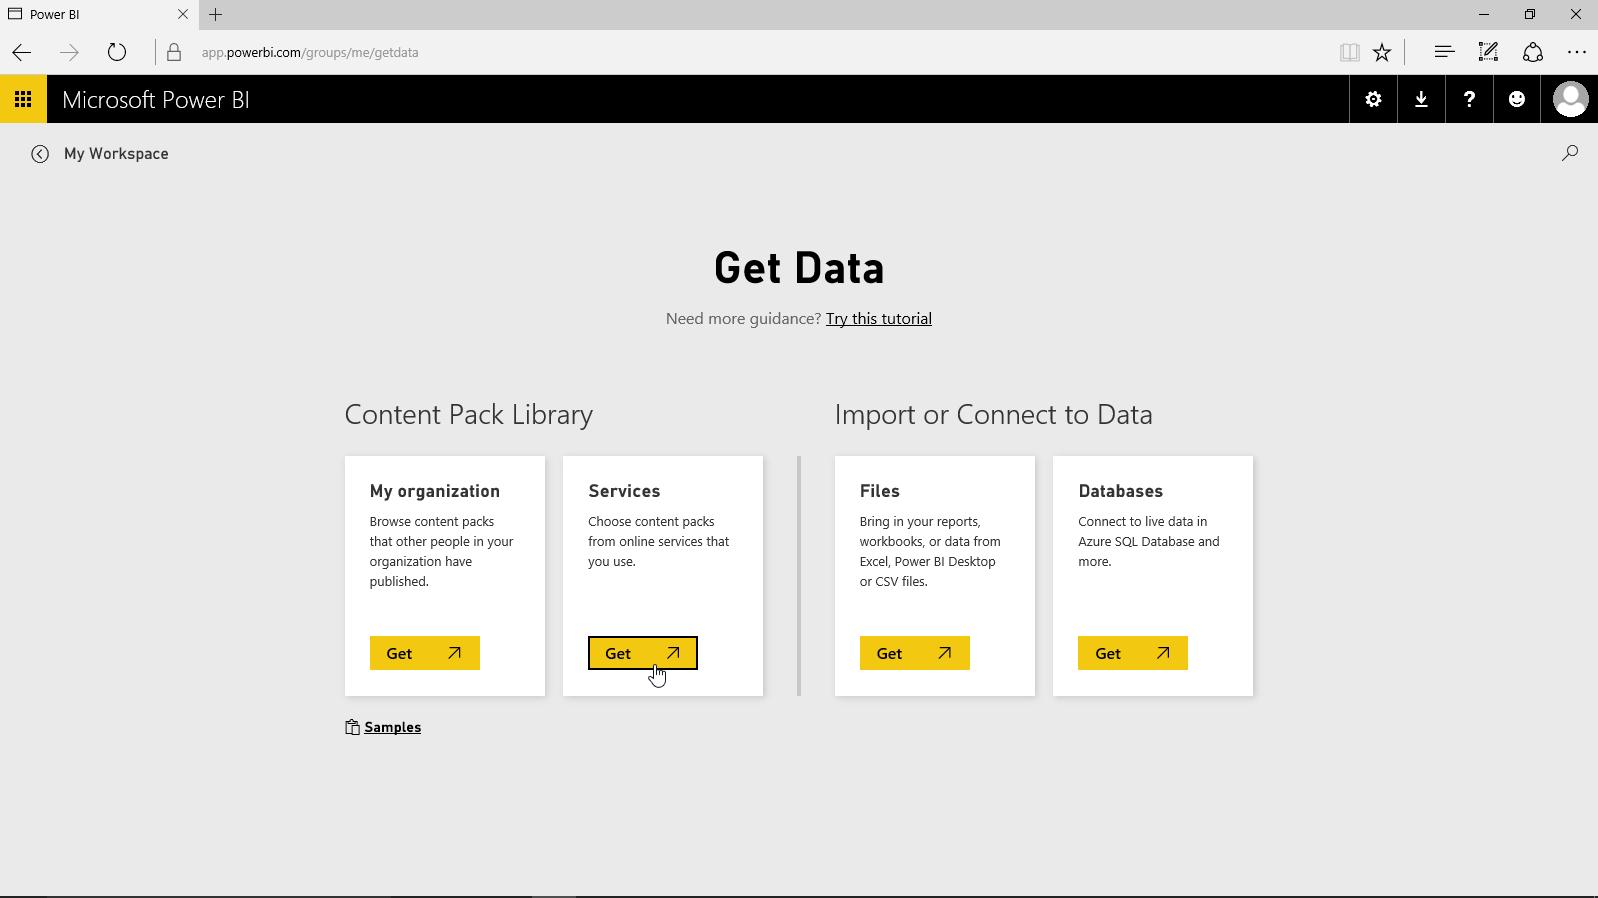 Power BI - Get Data